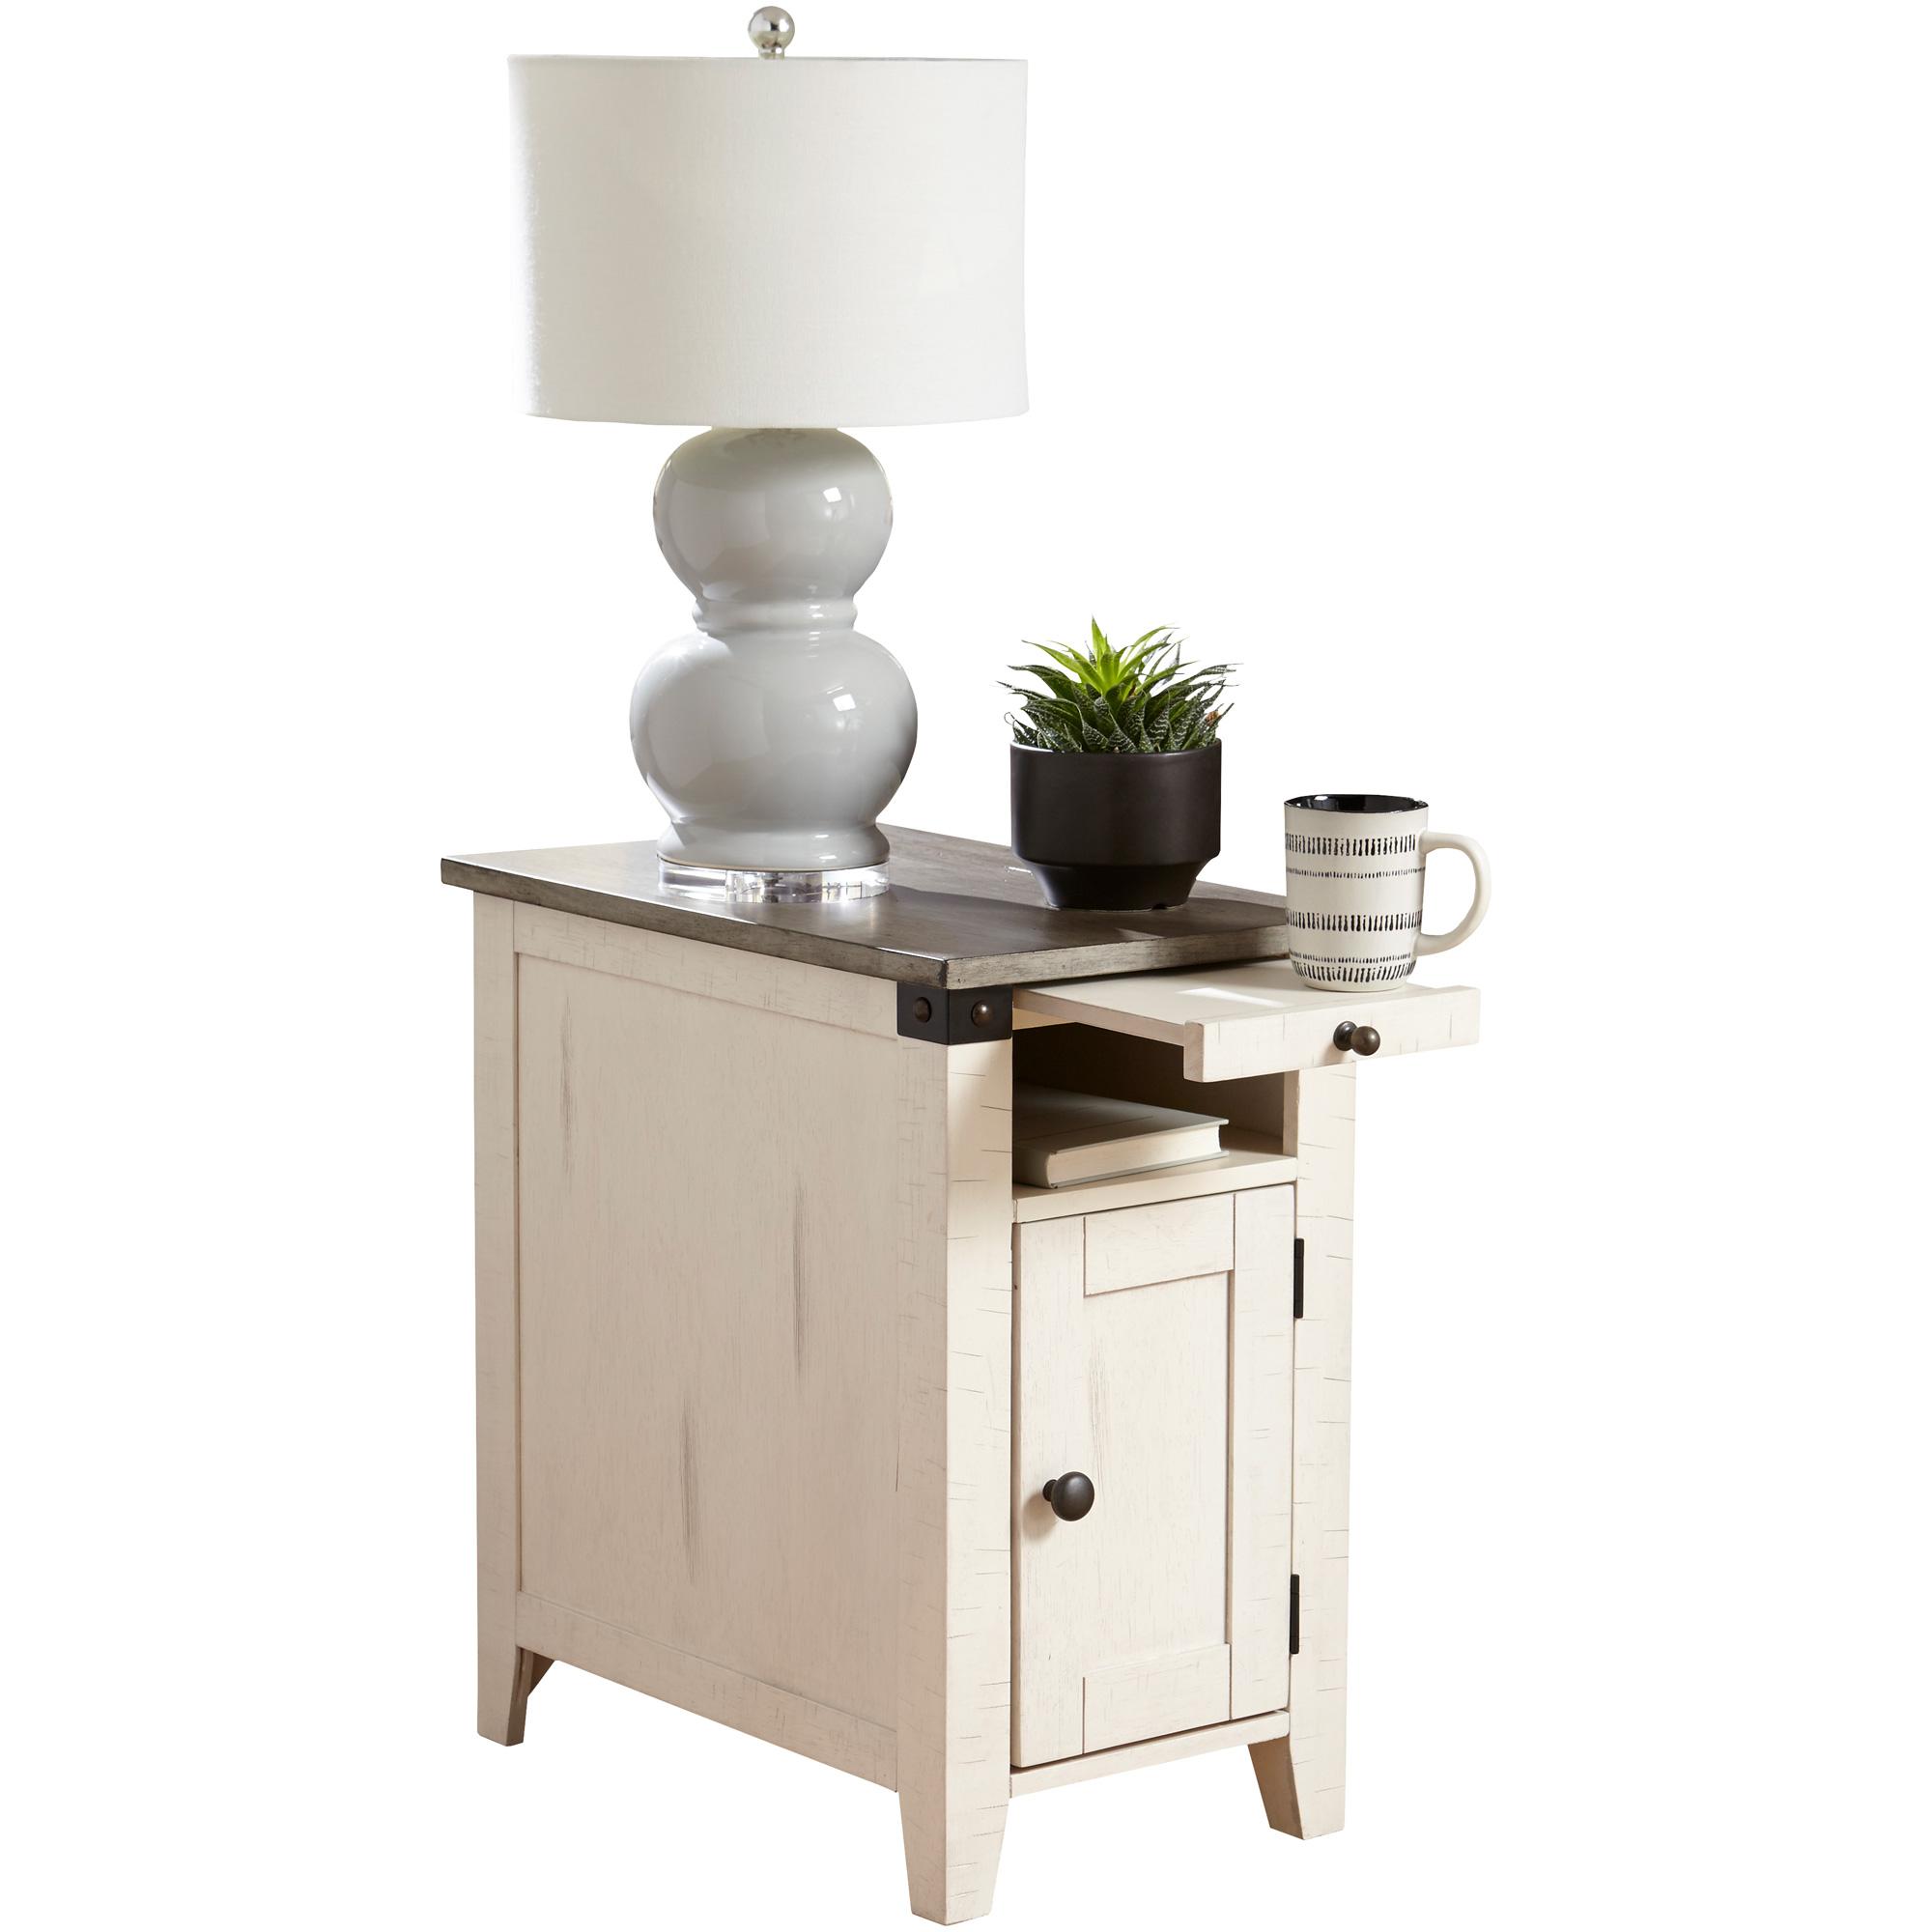 Martin Furniture | Dakota White and Gray Chairside Table